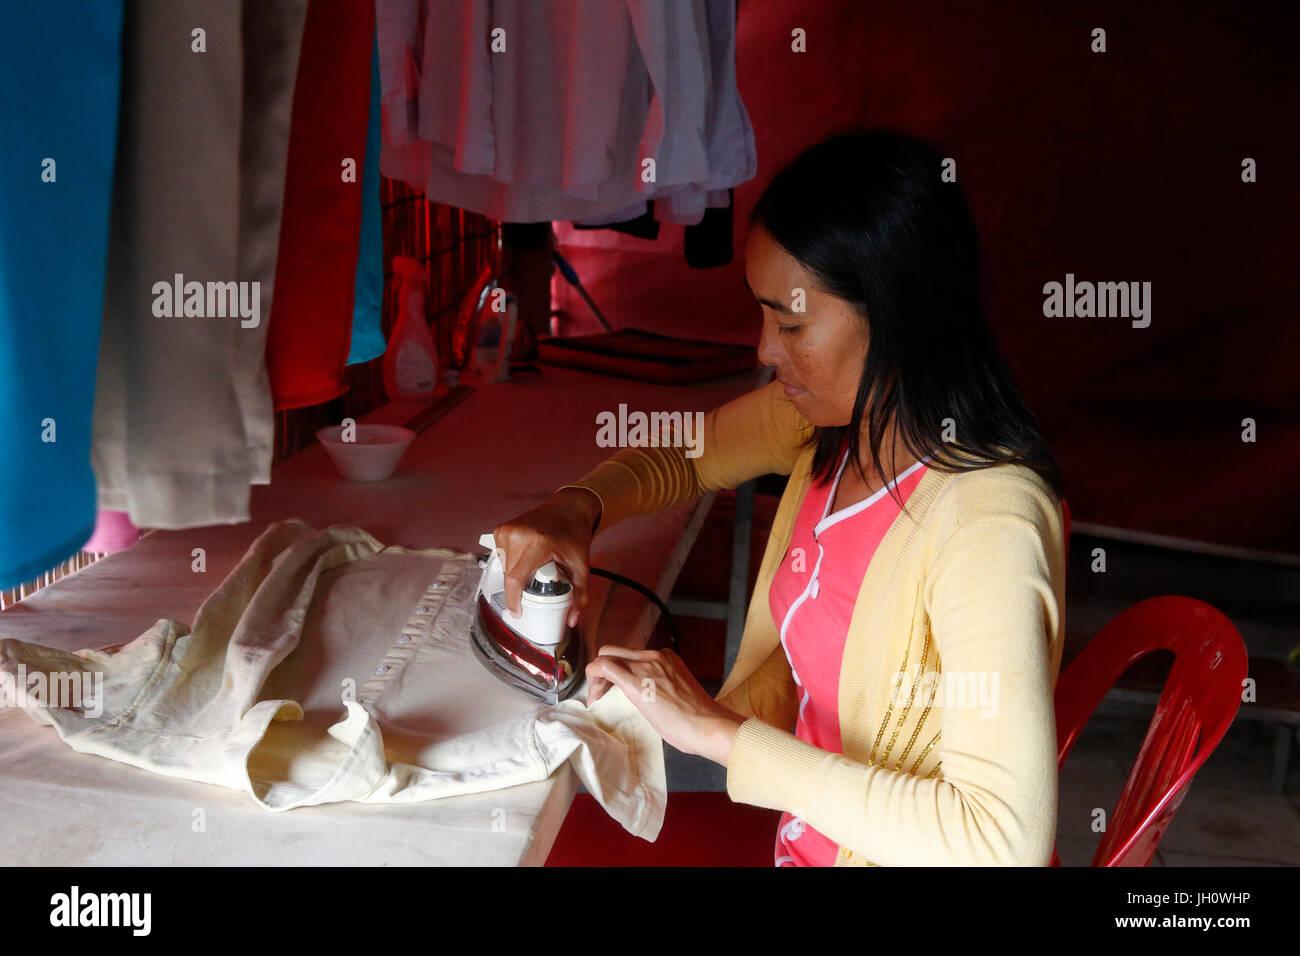 El programa Phare Ponleu Selpak circo. Etapa de planchado empleado trajes. Camboya. Imagen De Stock